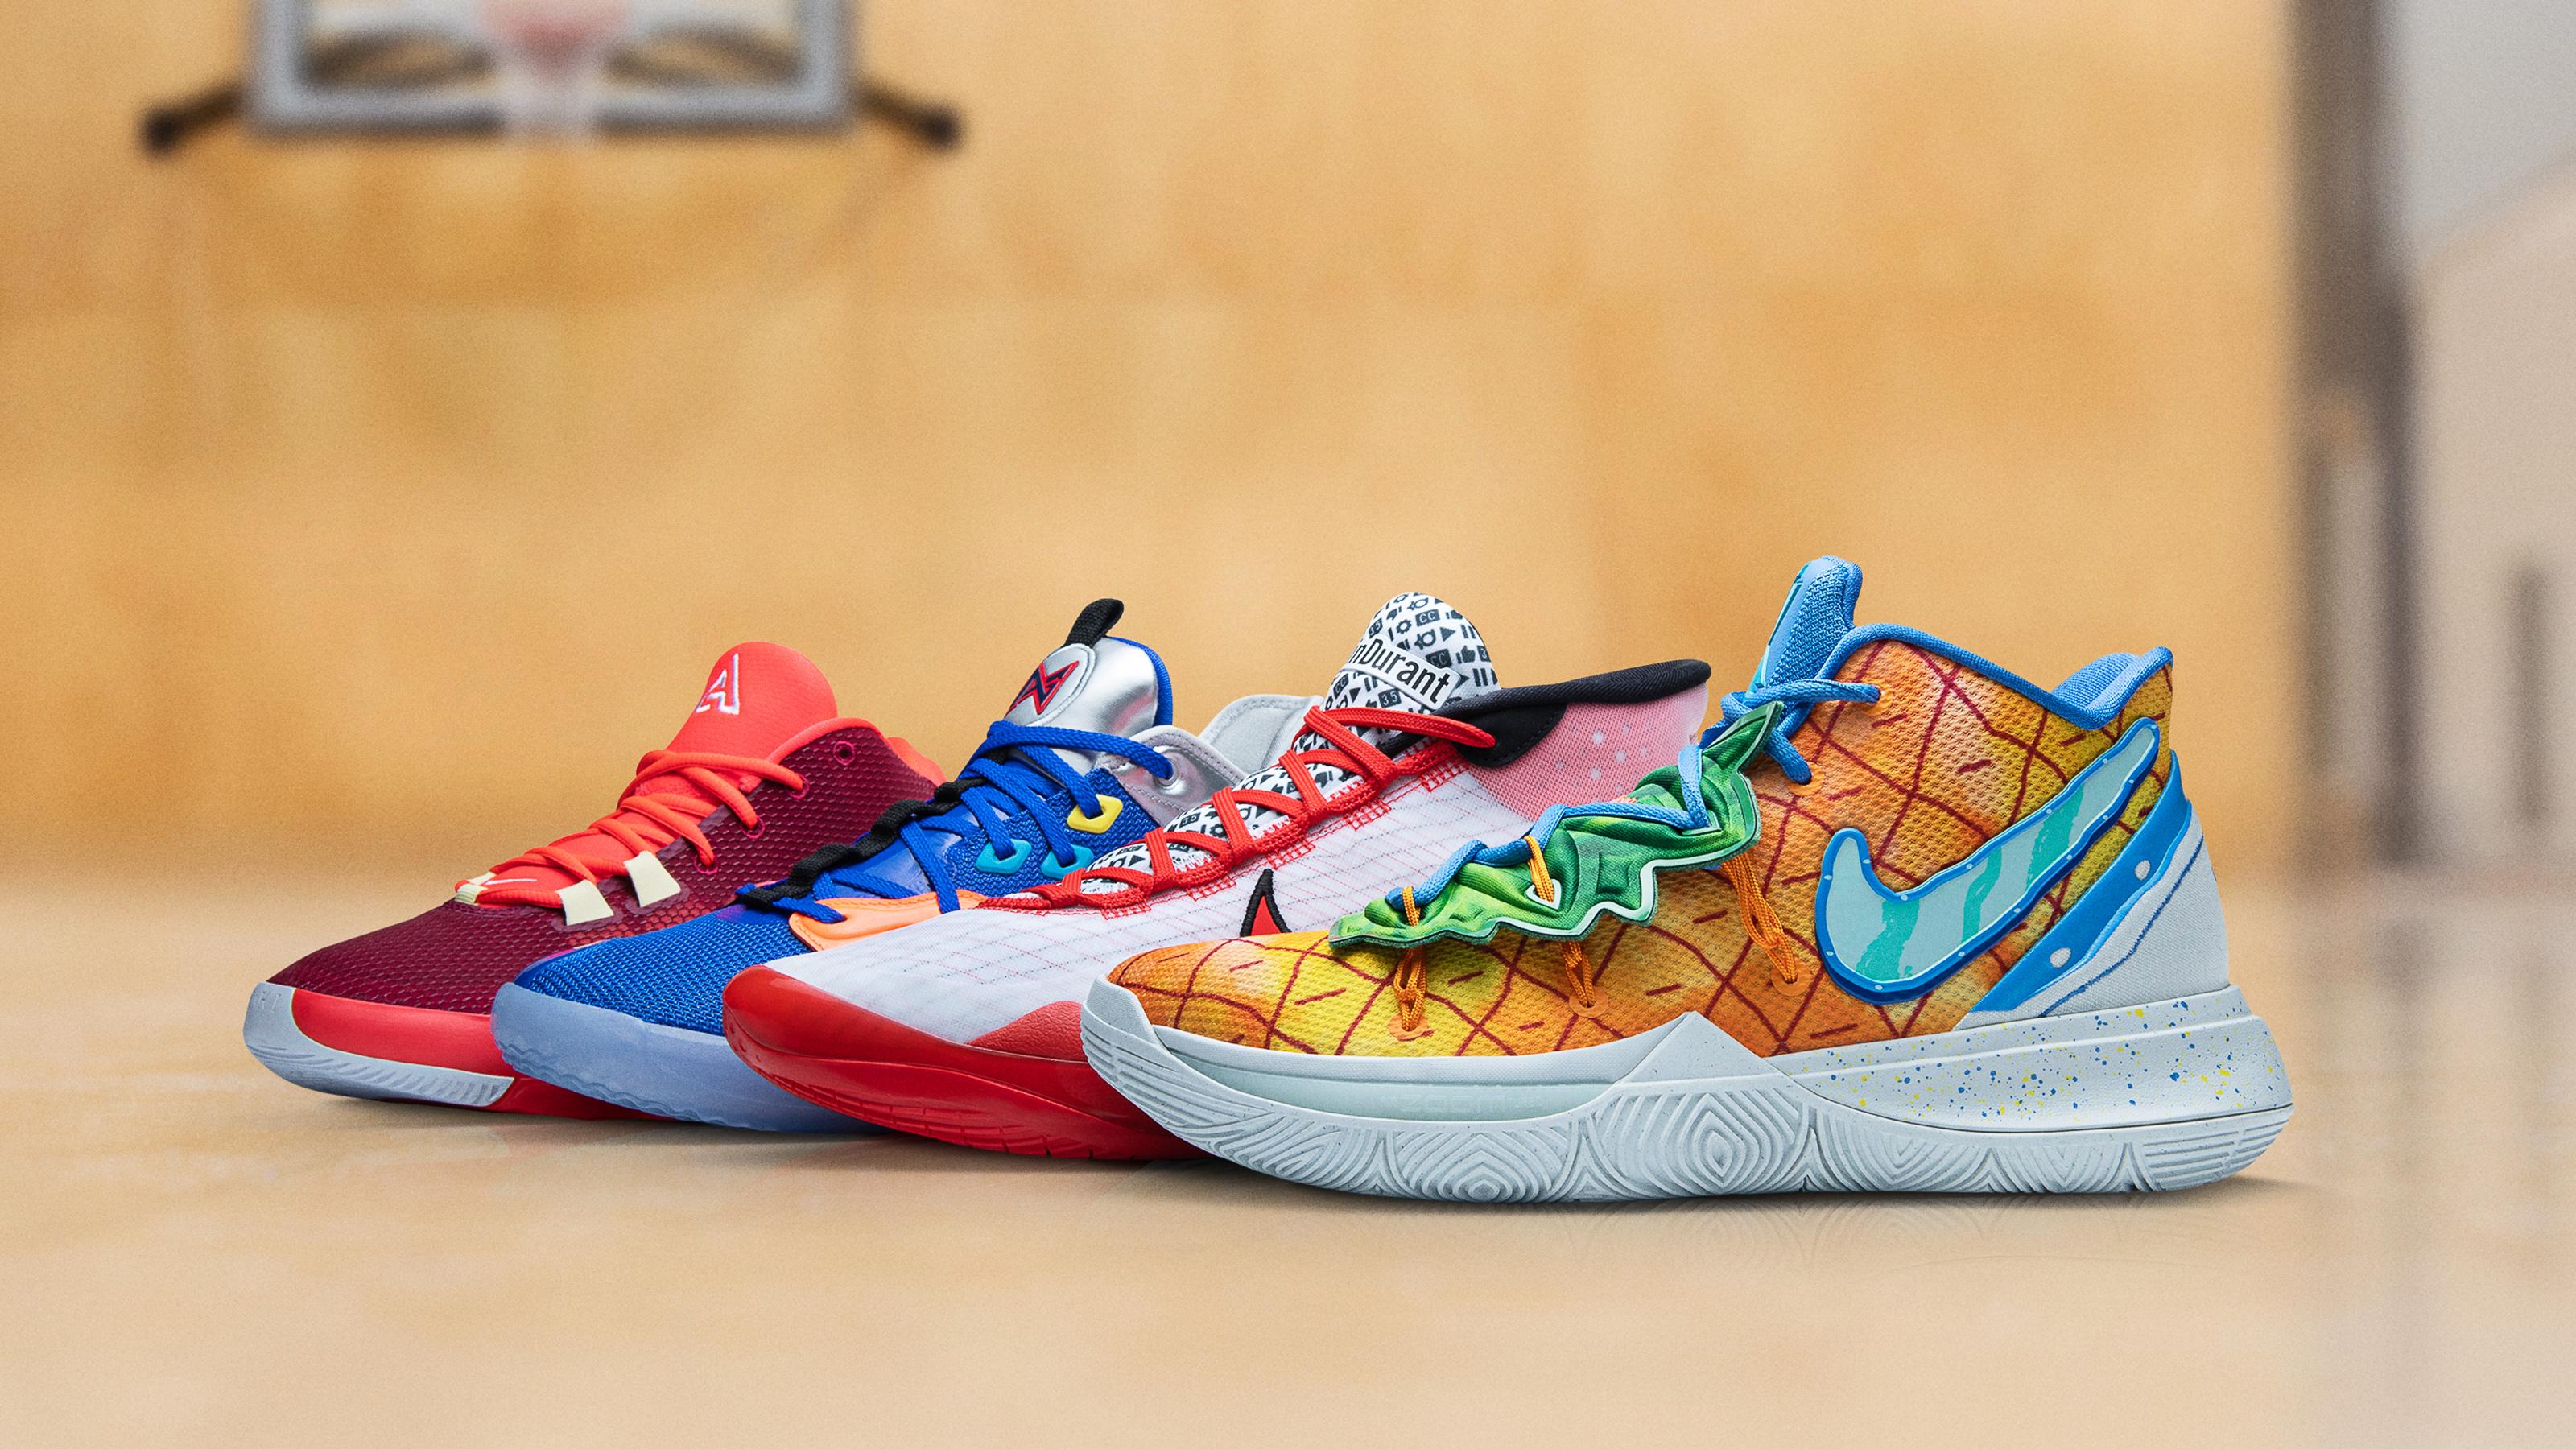 Nike's Spongebob Squarepants, Kyrie 5